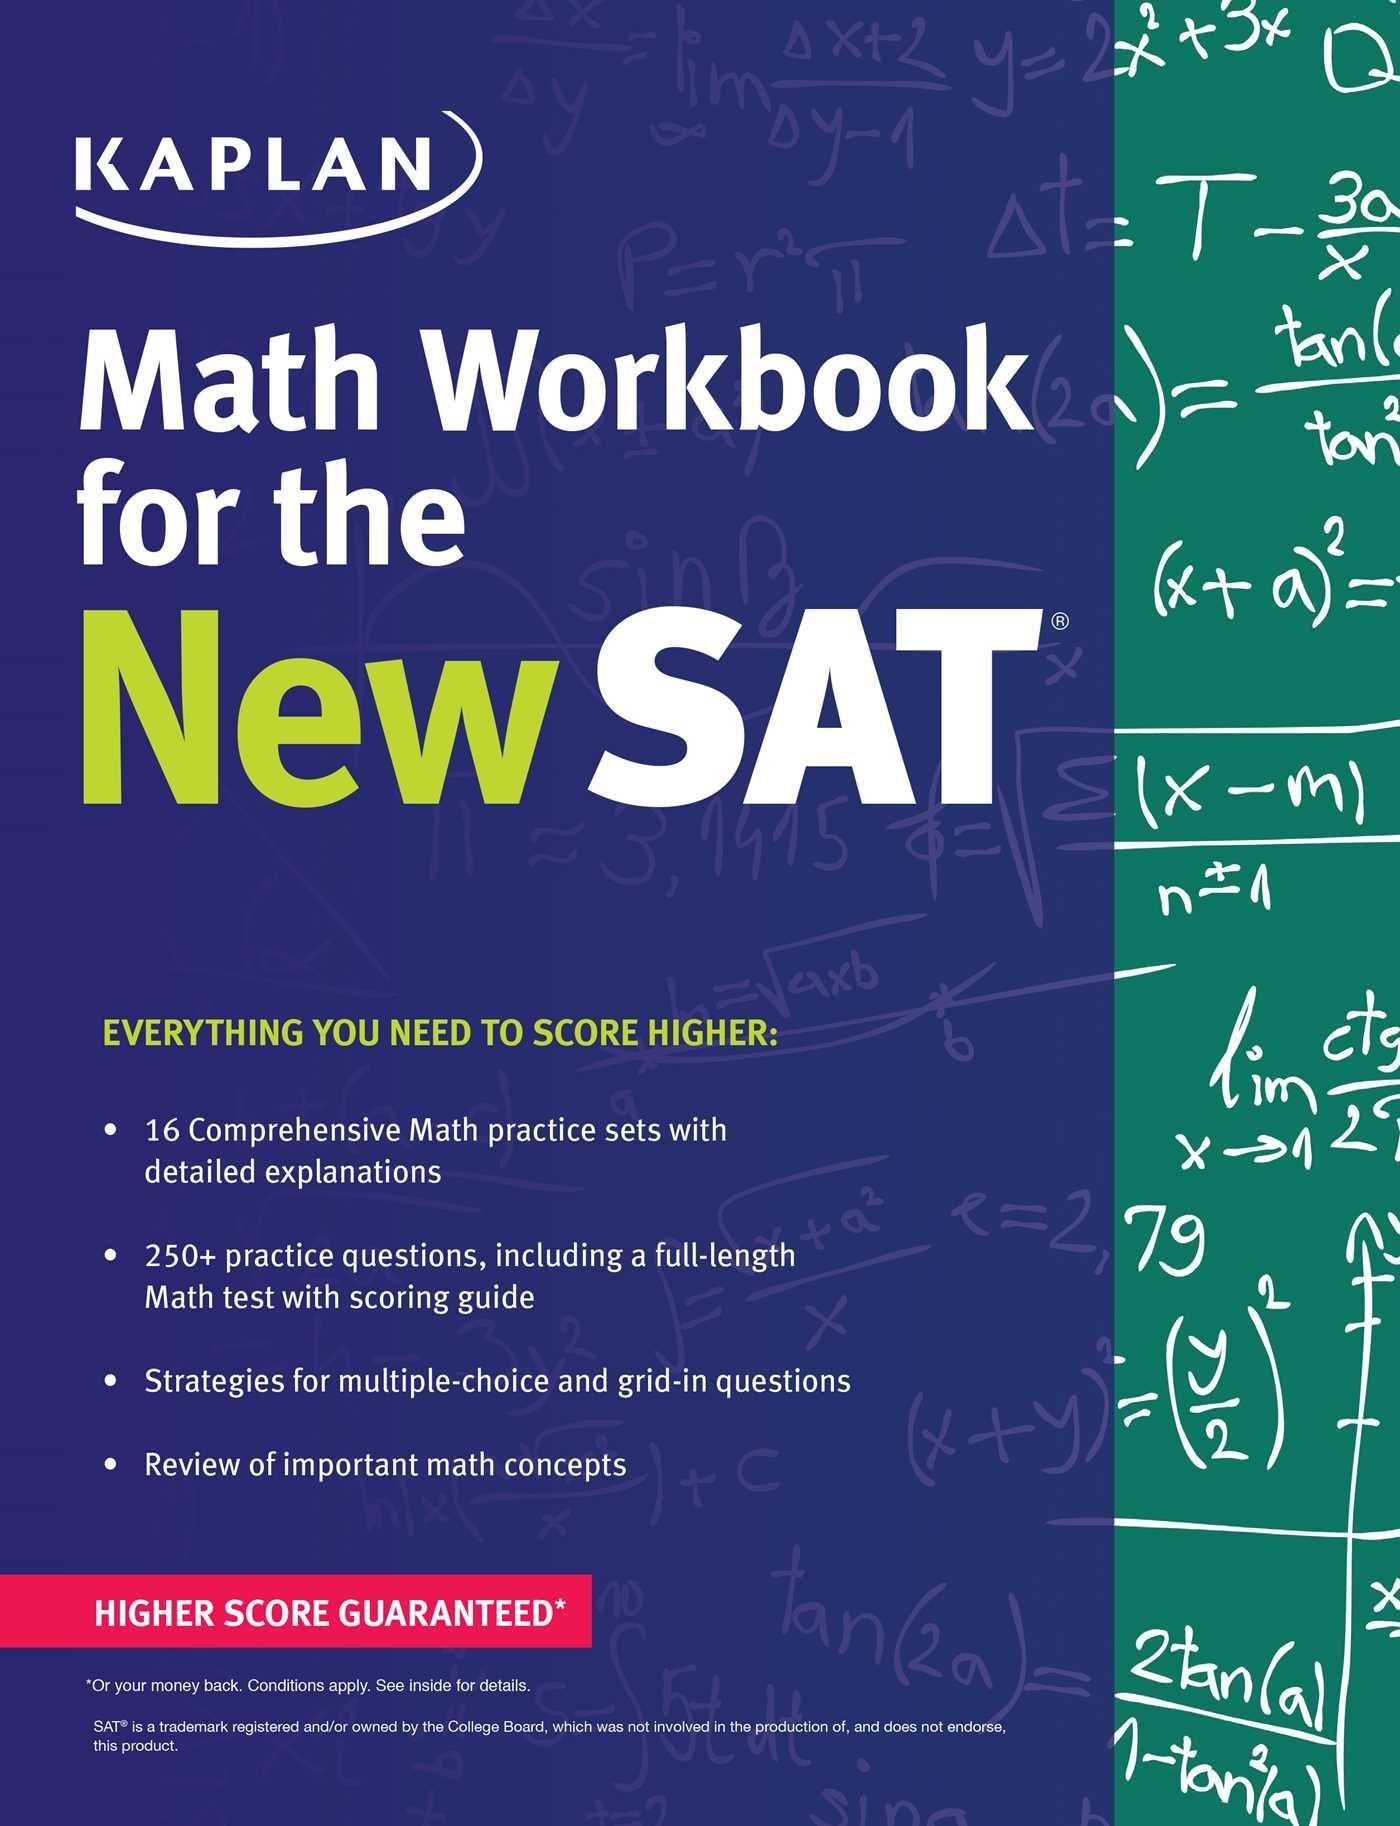 Worksheets Sat Math Prep Worksheets amazon com kaplan math workbook for the new sat test prep 9781625231550 books